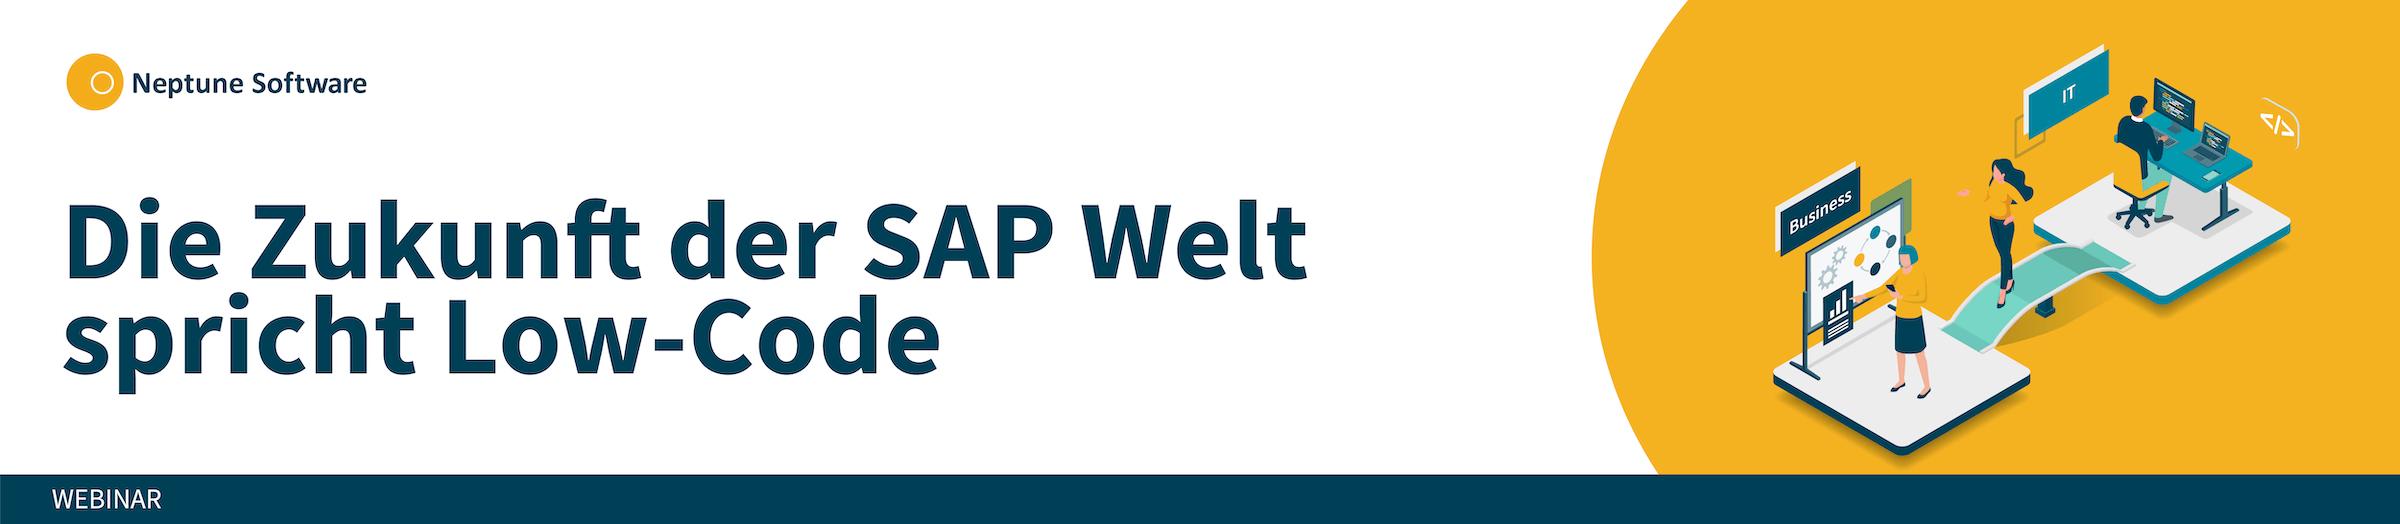 SAP Fiori App Entwicklung mit Low Code